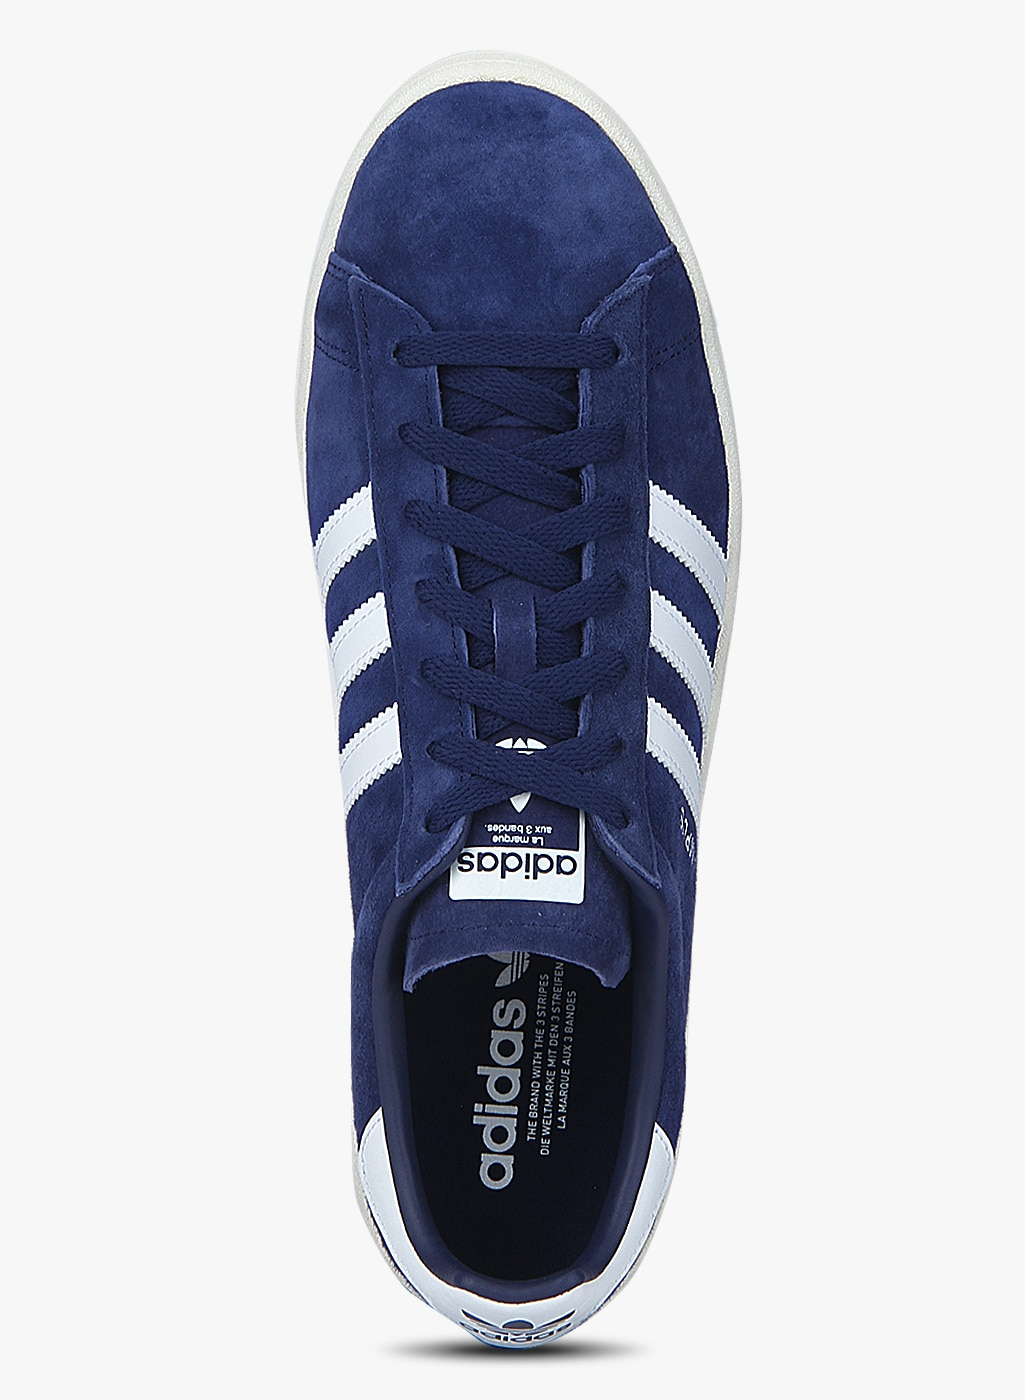 46aff2f490a Brown Navy Blue Blue Men Shoes Adidas Originals - Buy Brown Navy Blue Blue  Men Shoes Adidas Originals online in India - Jabong